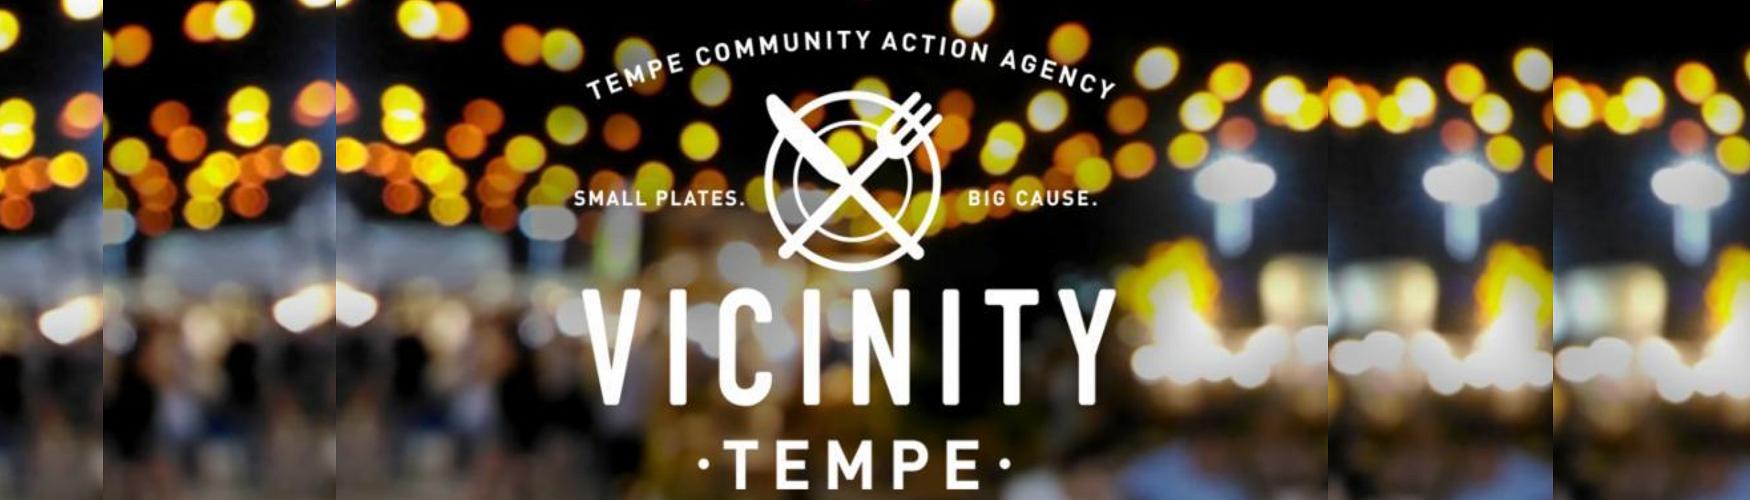 VICINITY Tempe 2019